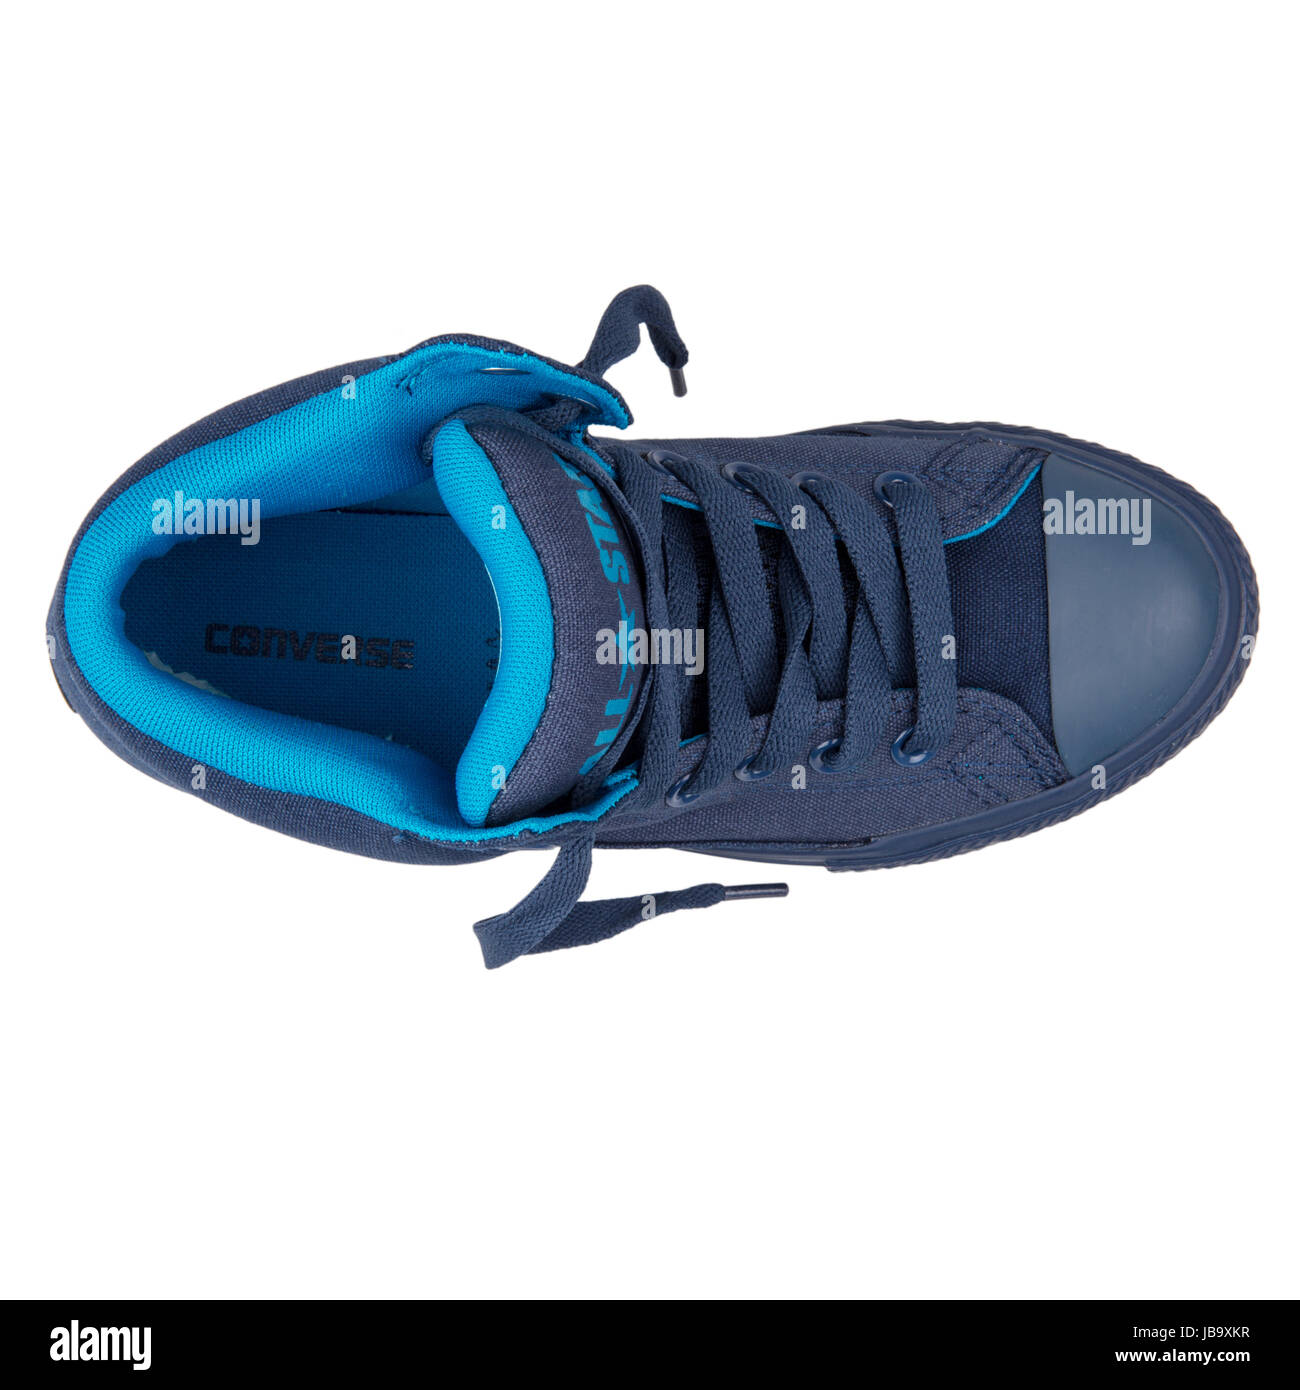 994b1b1ac04 Converse Chuck Taylor All Star High Street Navy Cyan Blue Junior s Shoes -  650117C - Stock